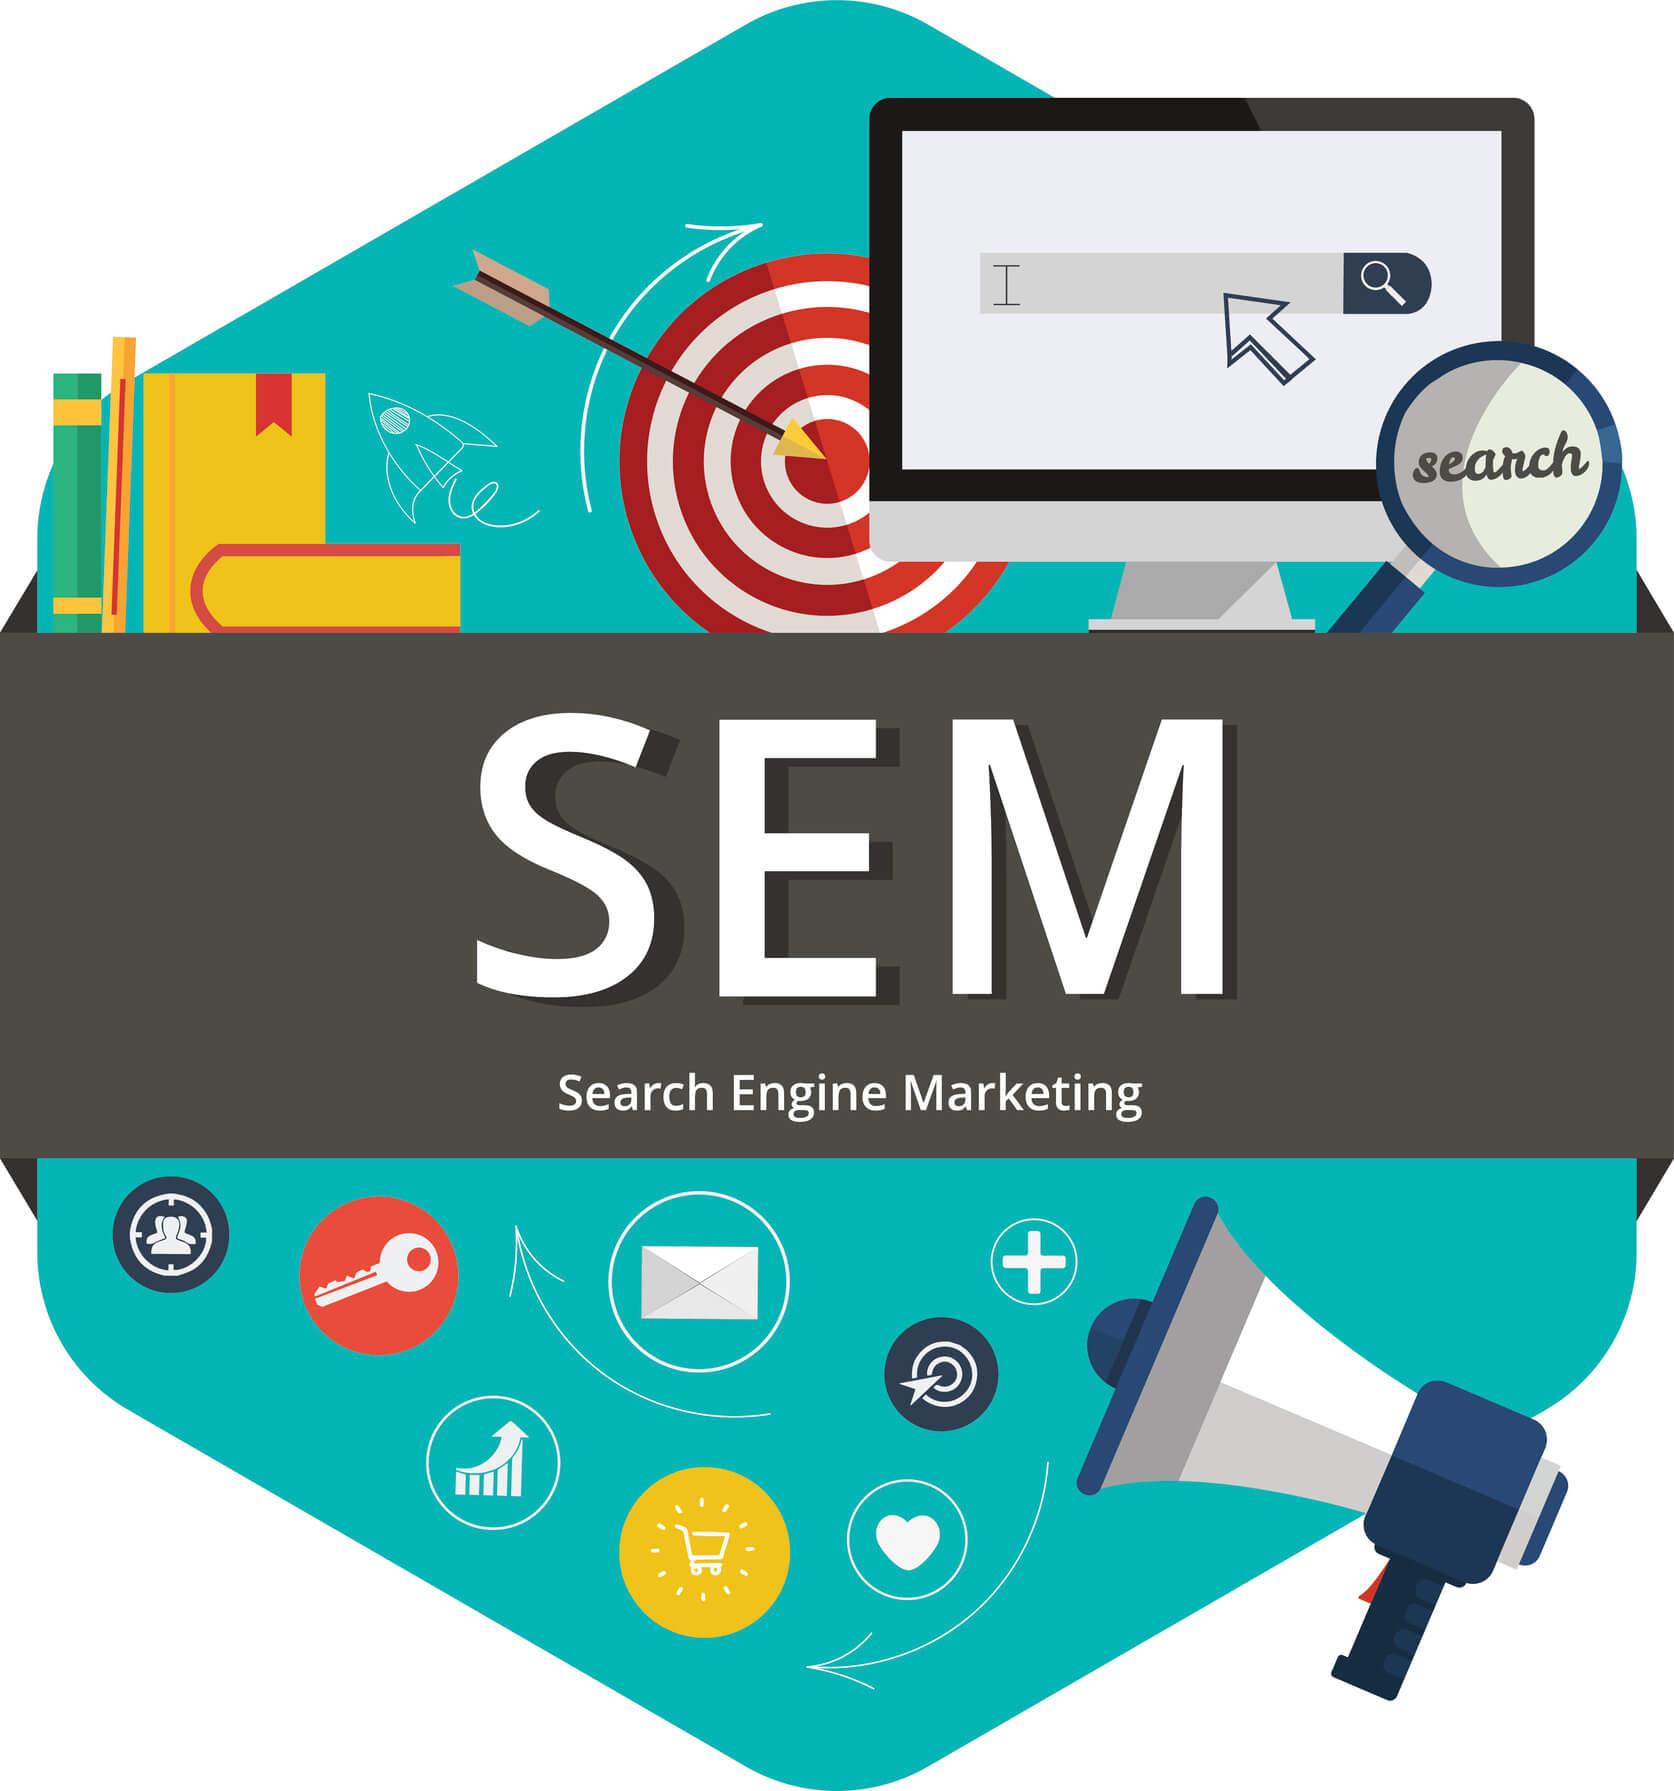 Search Engine Marketing - Engage, Promote, Optimize, Measure